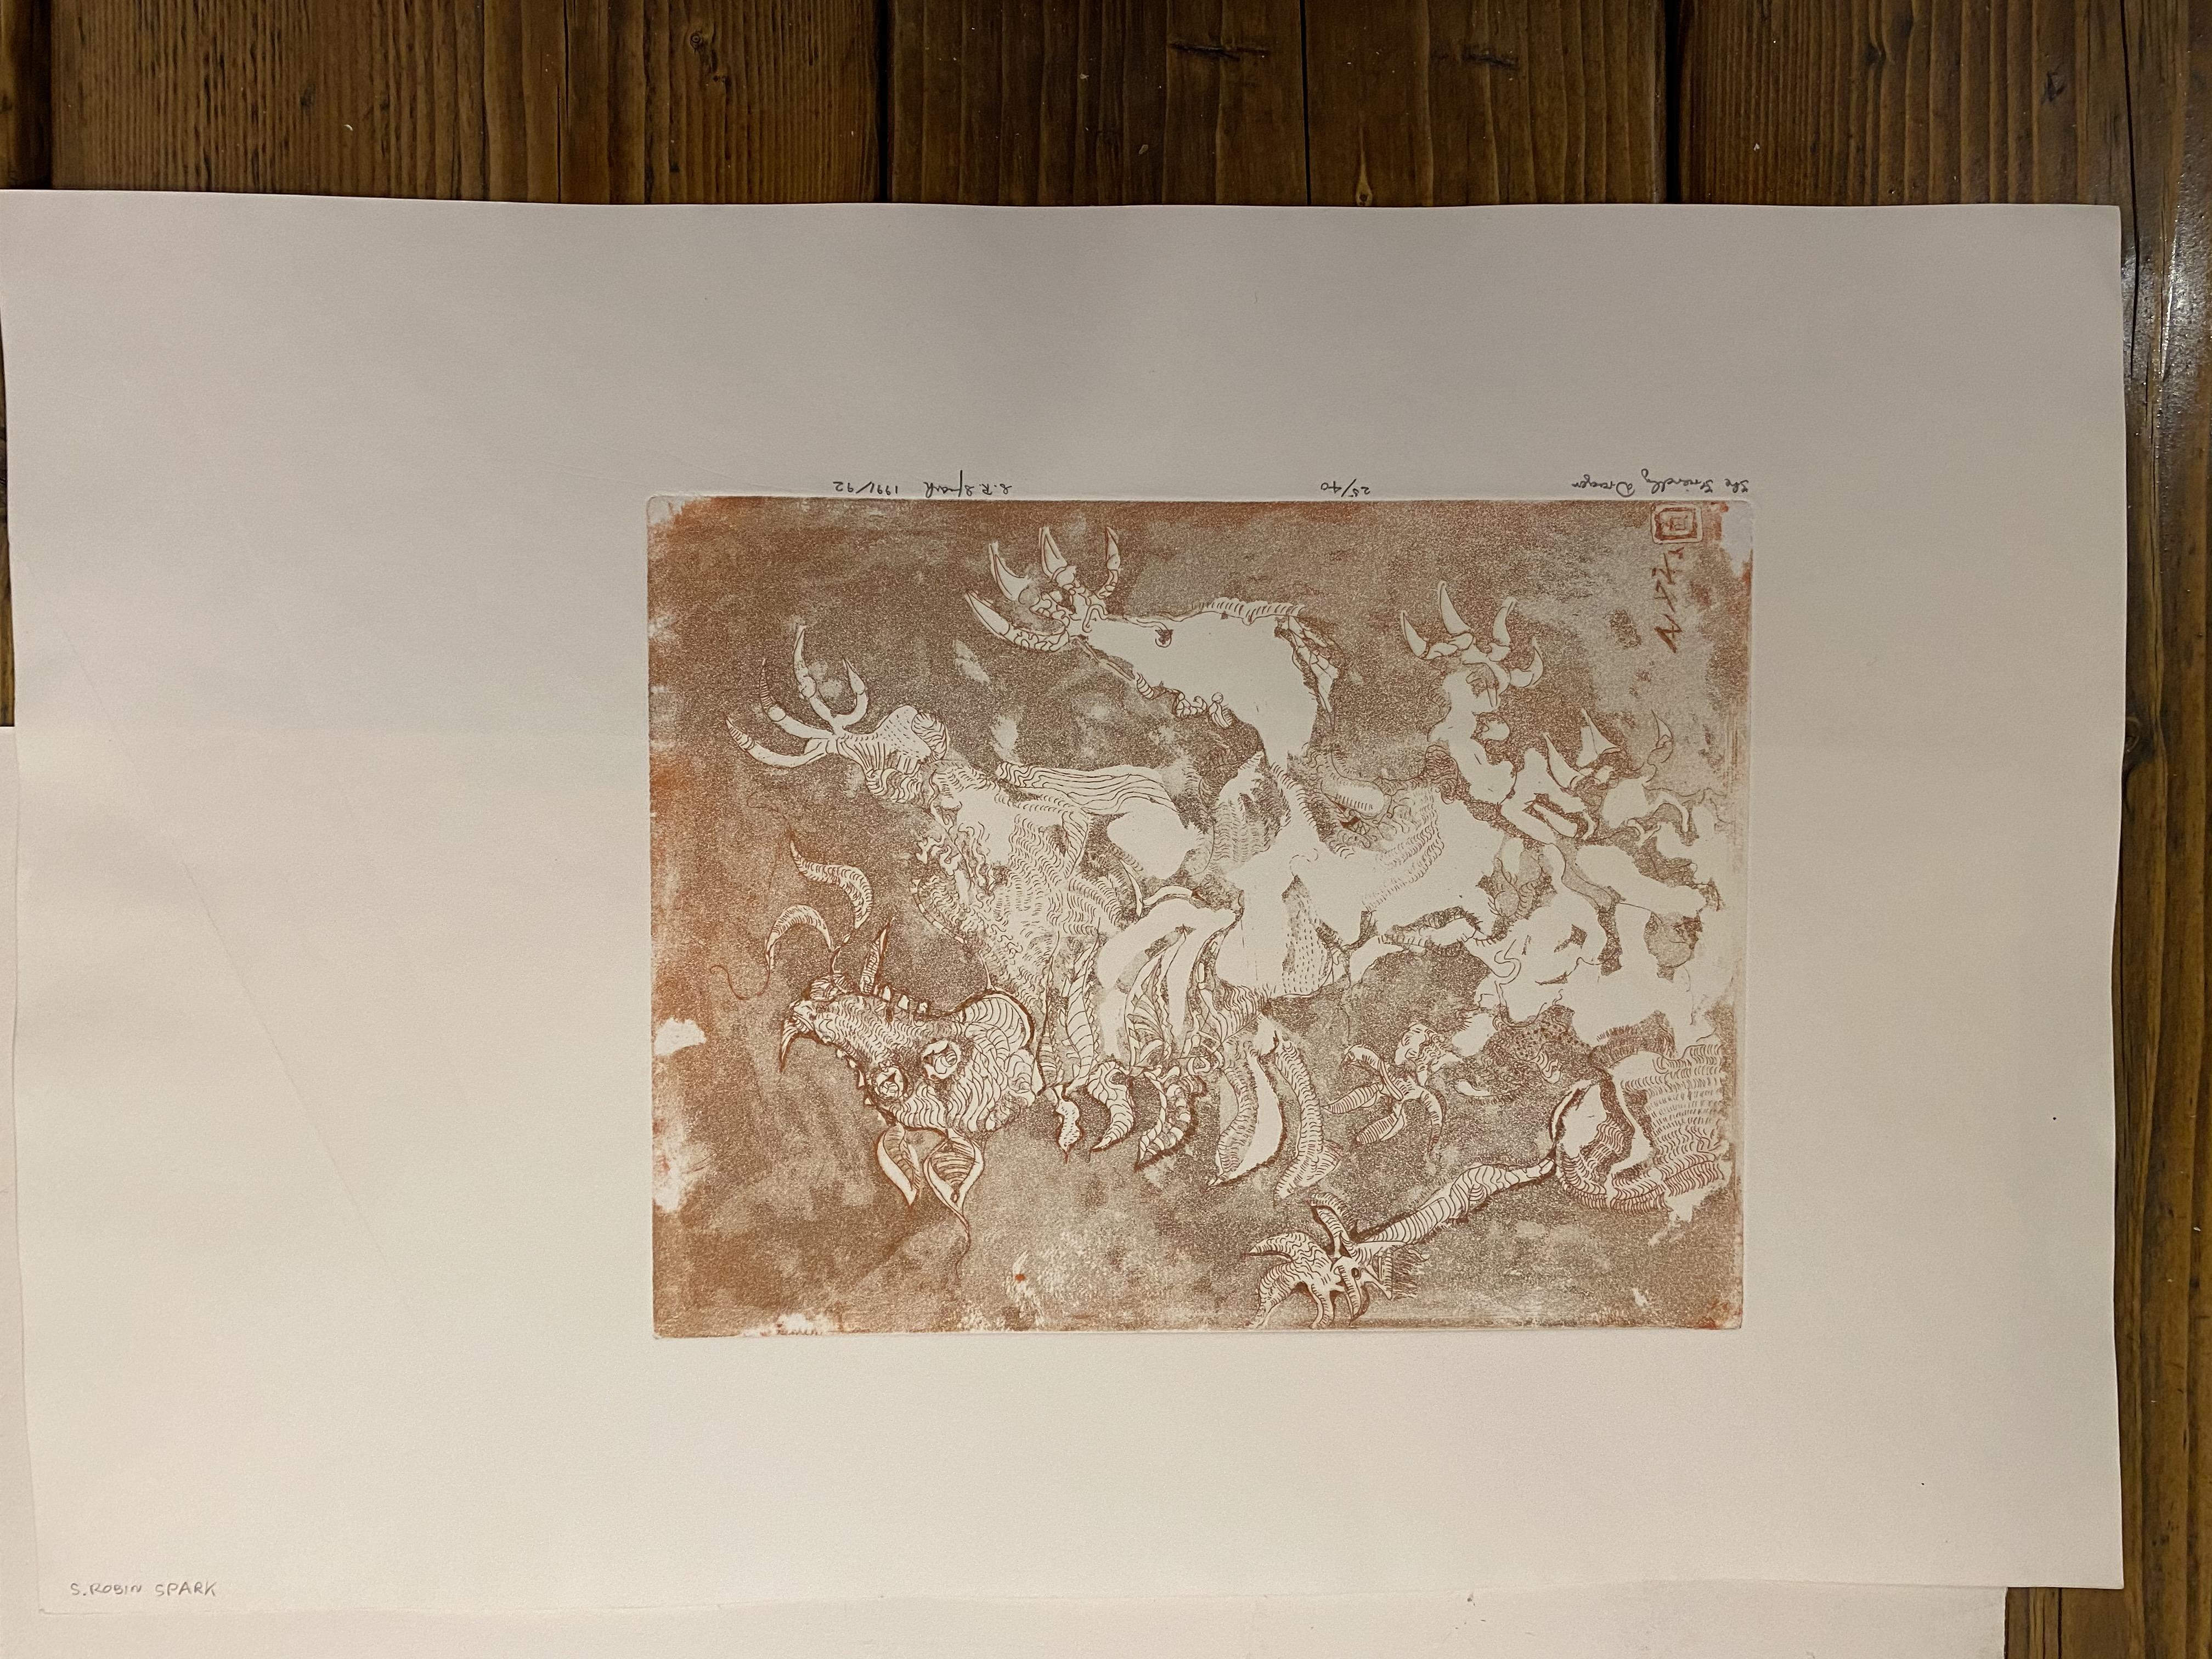 Samuel Robin Spark, The Friendly Dragon Limited Edition Print 91/92